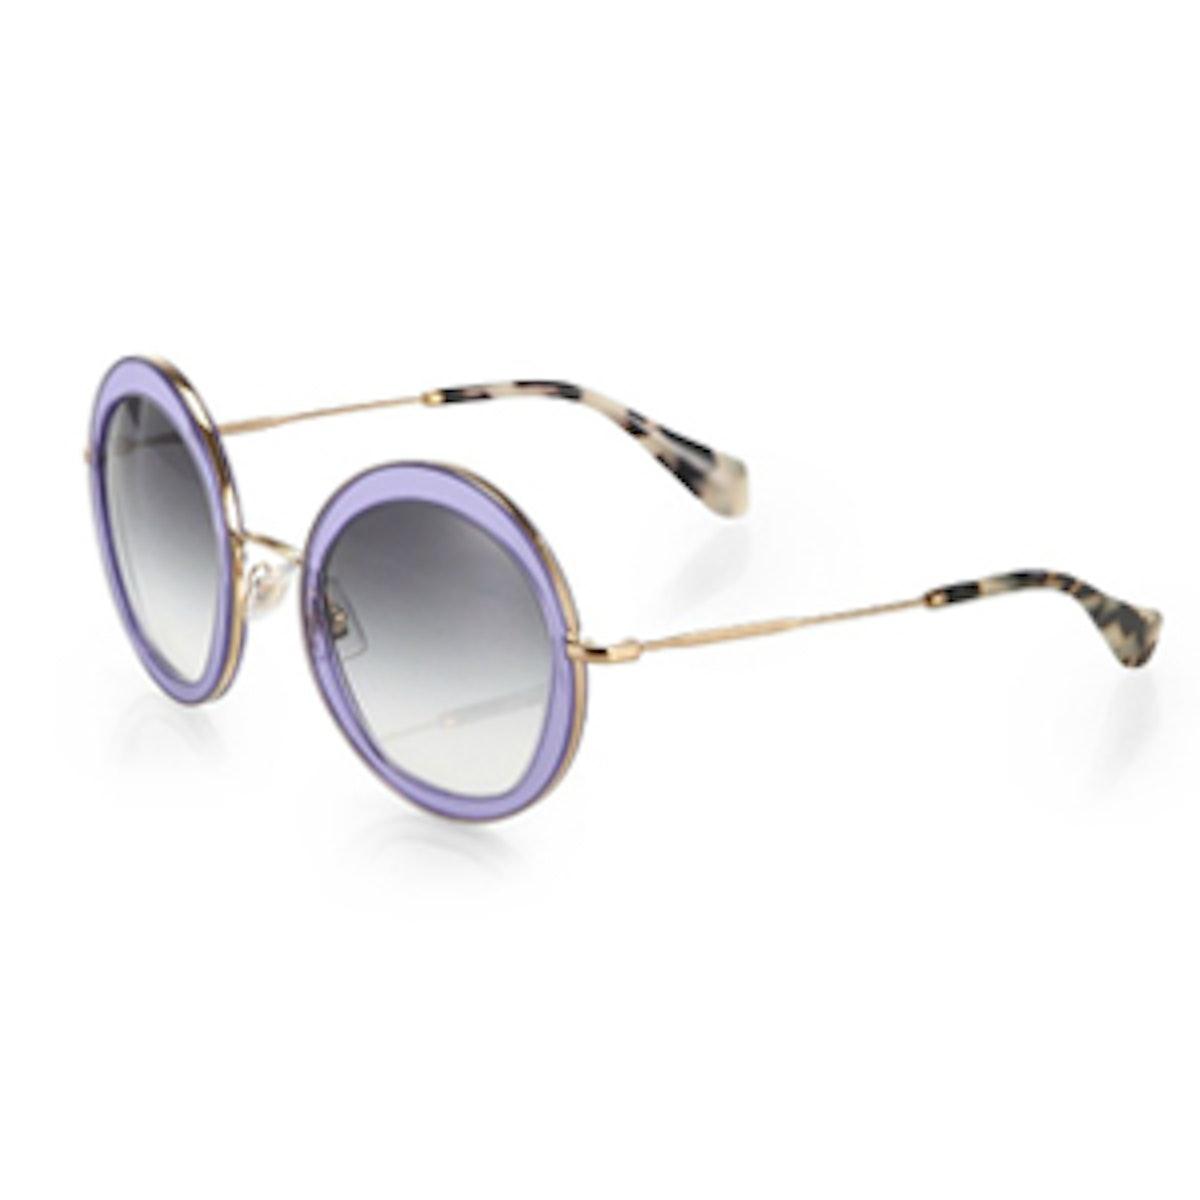 Pastel Round Sunglasses